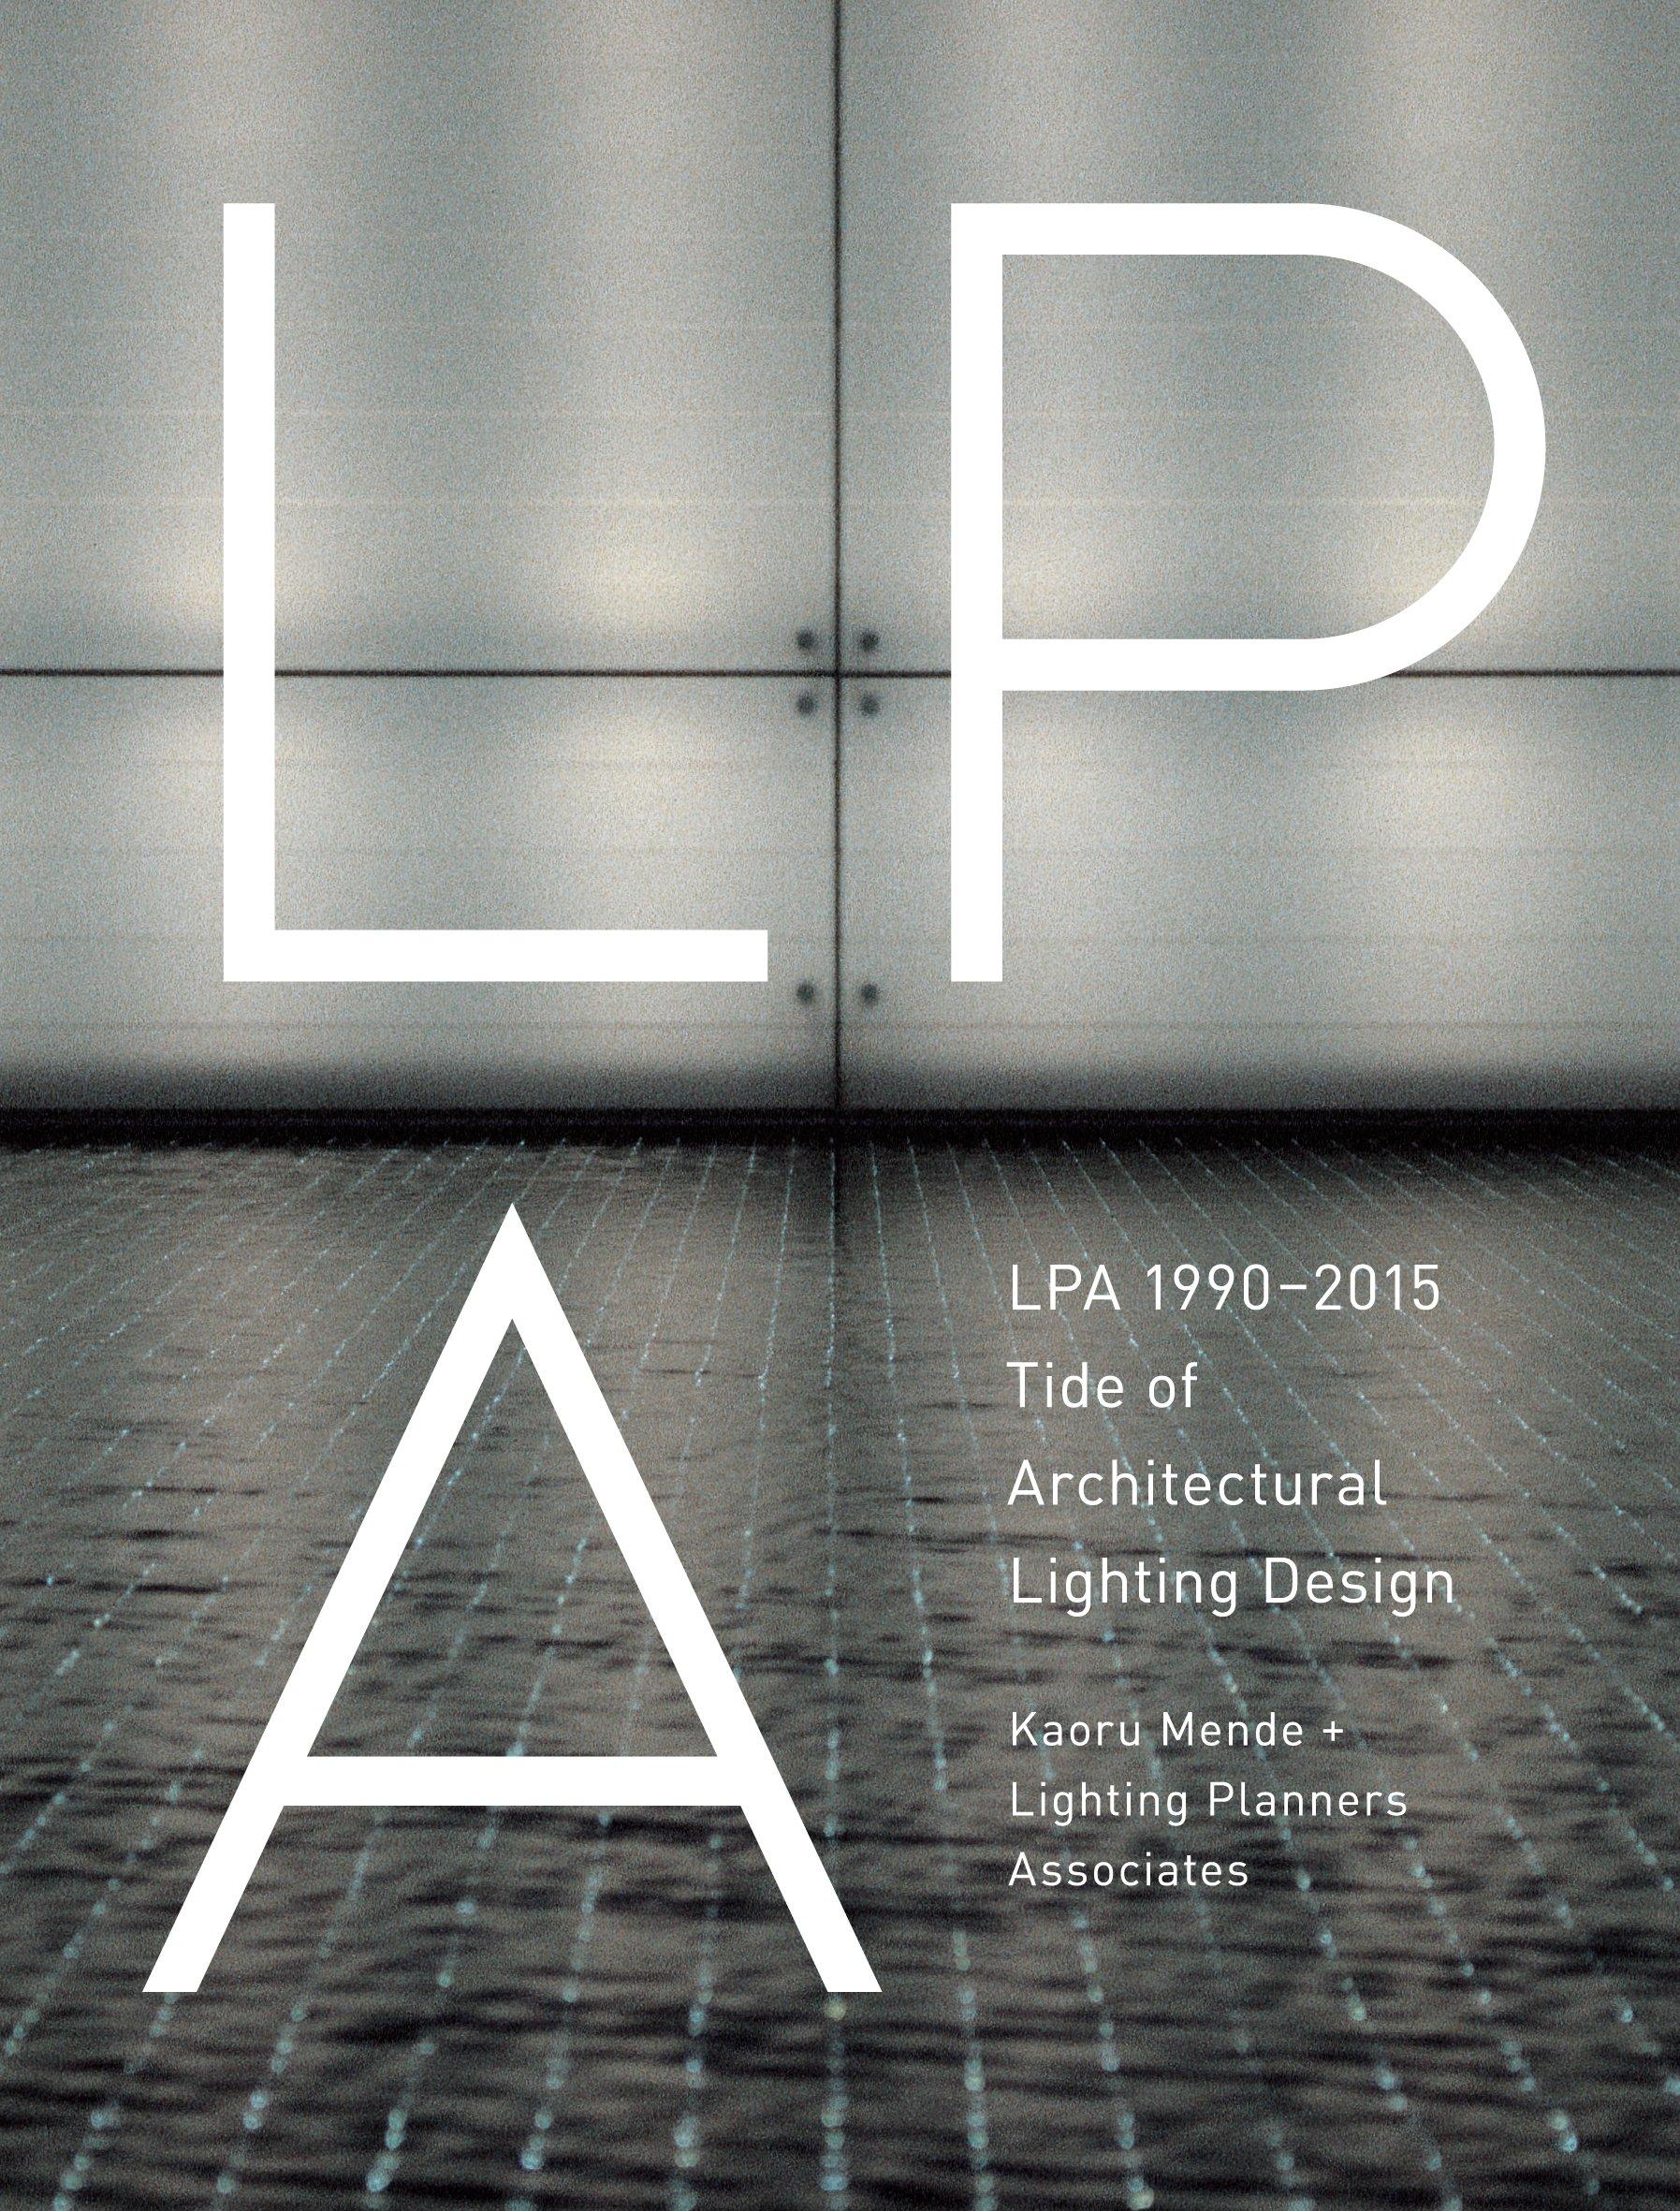 LPA 1990 2015 Tide Of Architectural Lighting Design: Kaoru Mende + LIGHTING  PLANNERS ASSOCIATES: 9784897377964: Amazon.com: Books